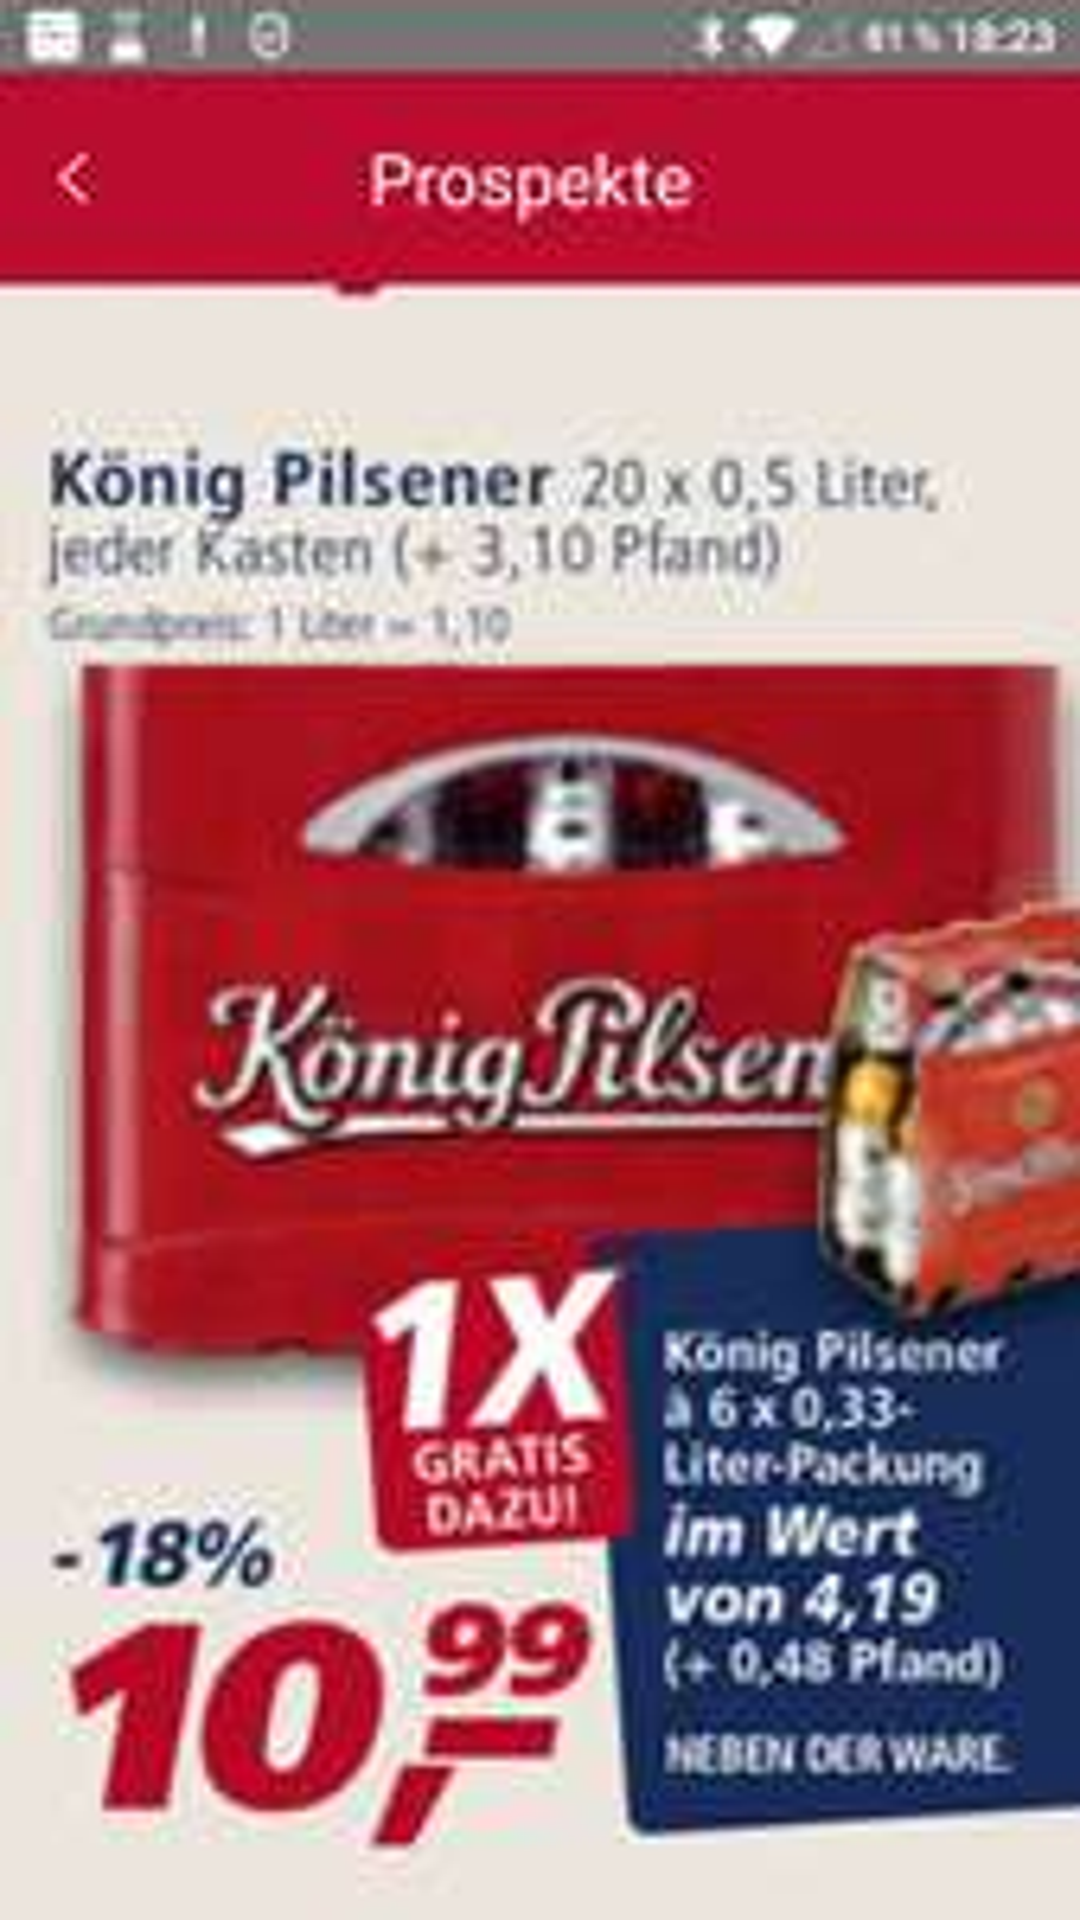 König Pilsener bei Real mit Sixpack gratis